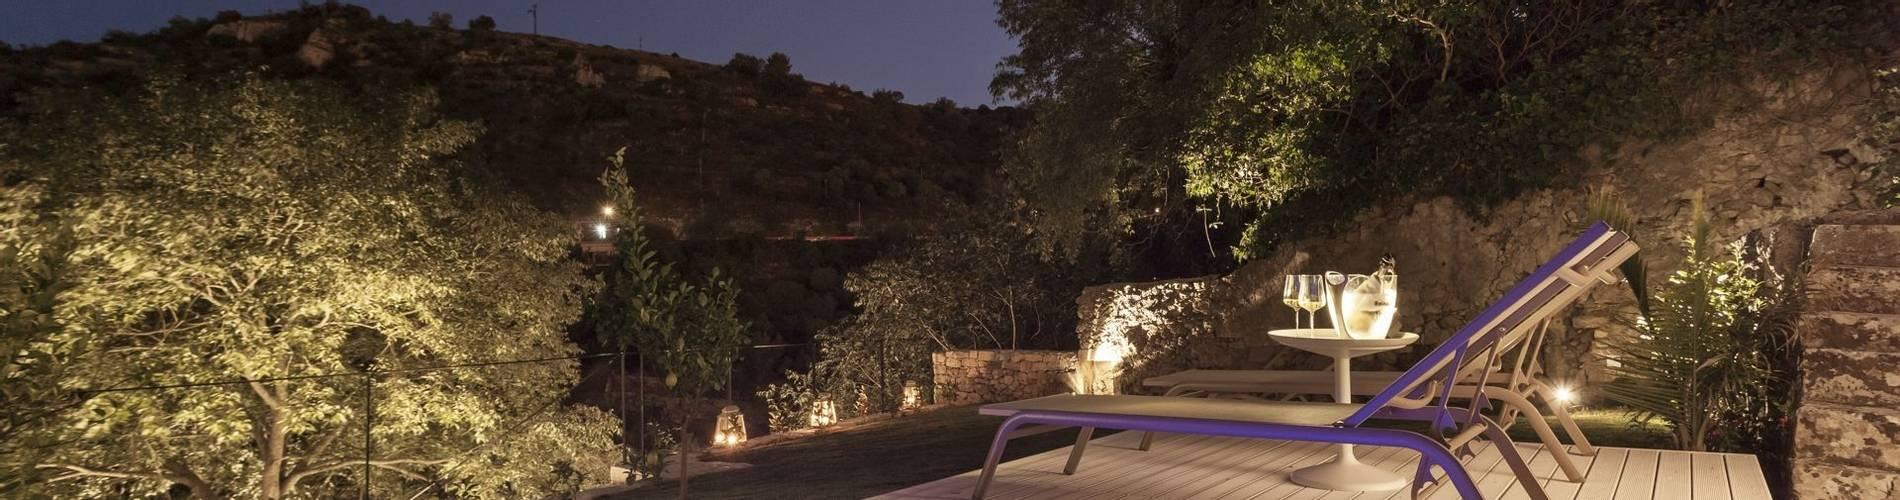 Locanda Don Serafino, Sicily, Italy, Luxury Suite (15).jpg